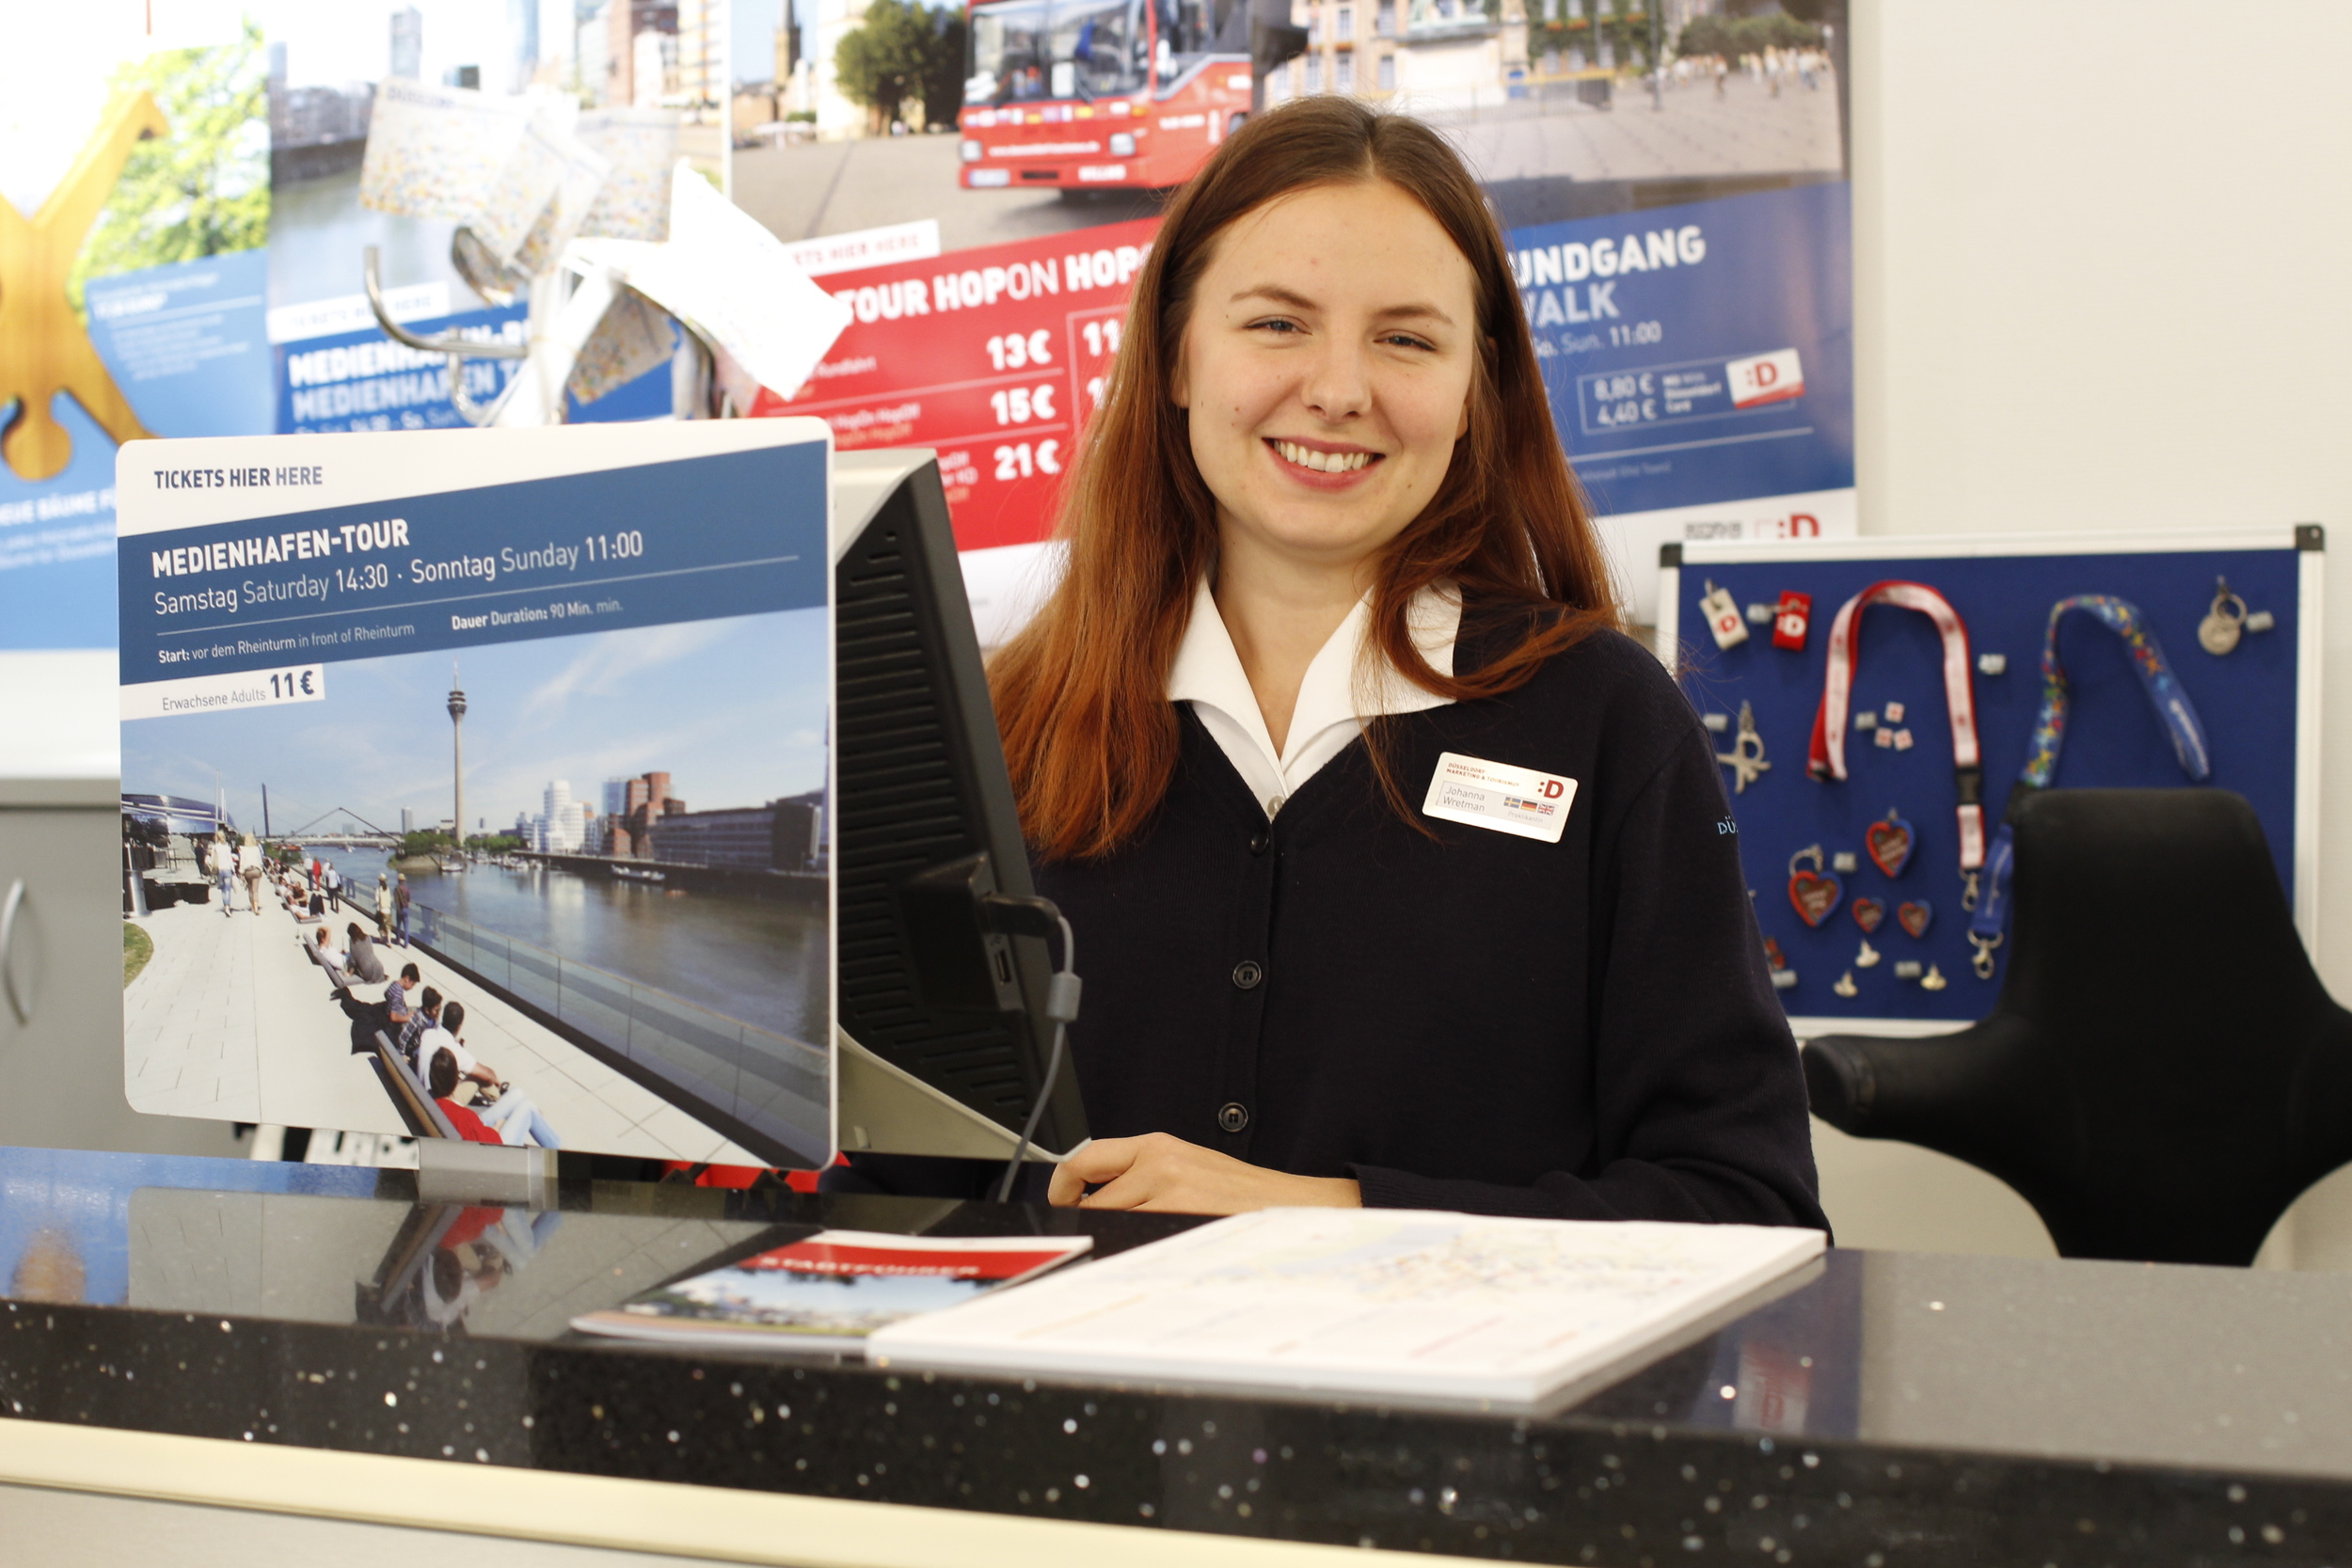 Johanna Wretman på turistinformationen i Düsseldorf.